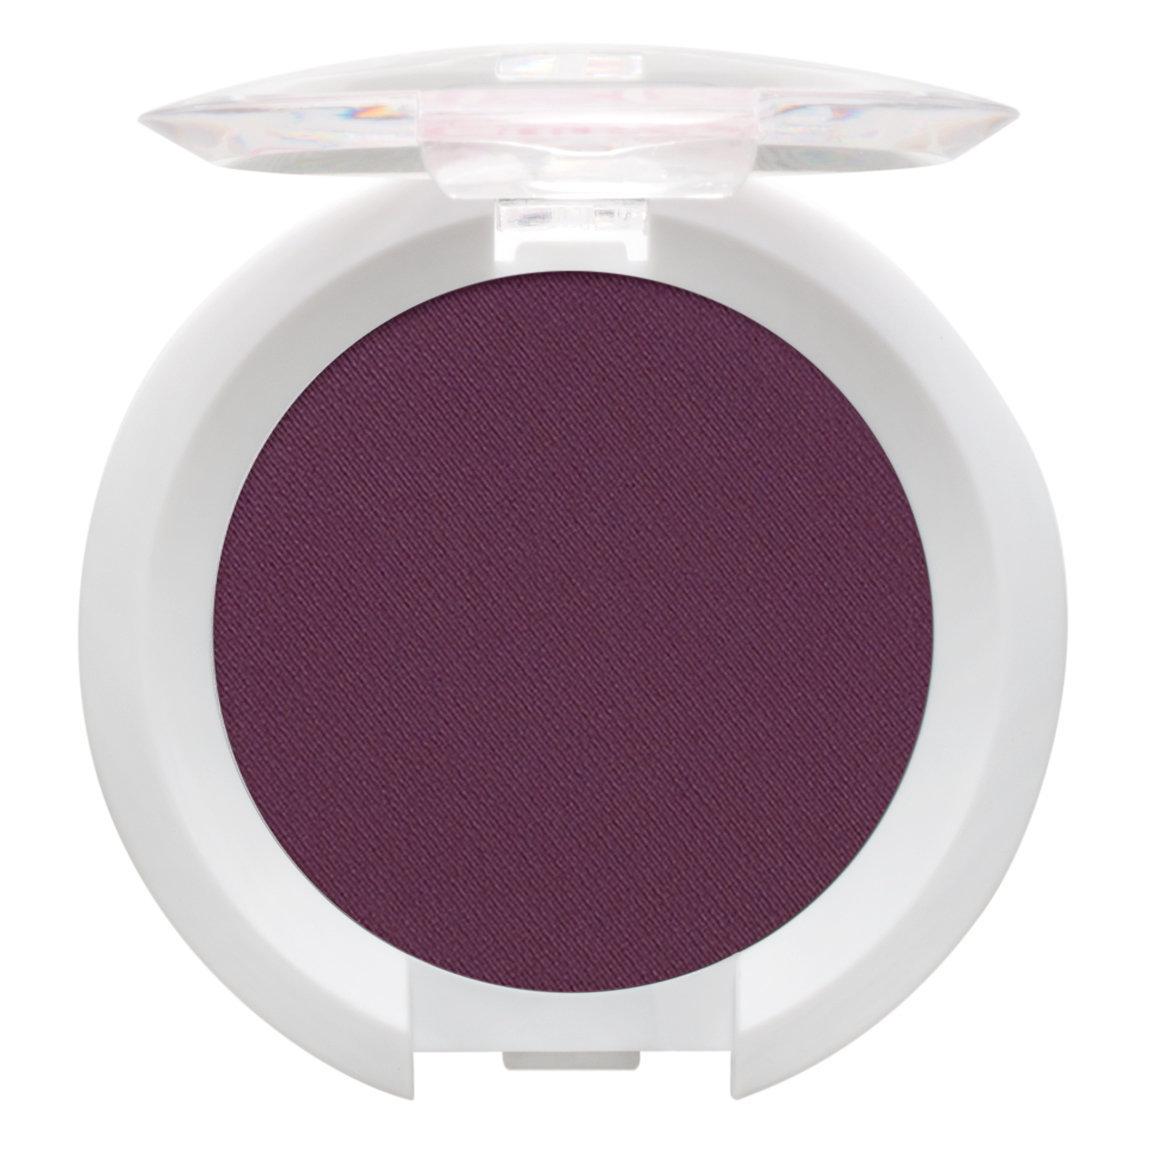 Sugarpill Cosmetics Pressed Eyeshadow Ego alternative view 1 - product swatch.